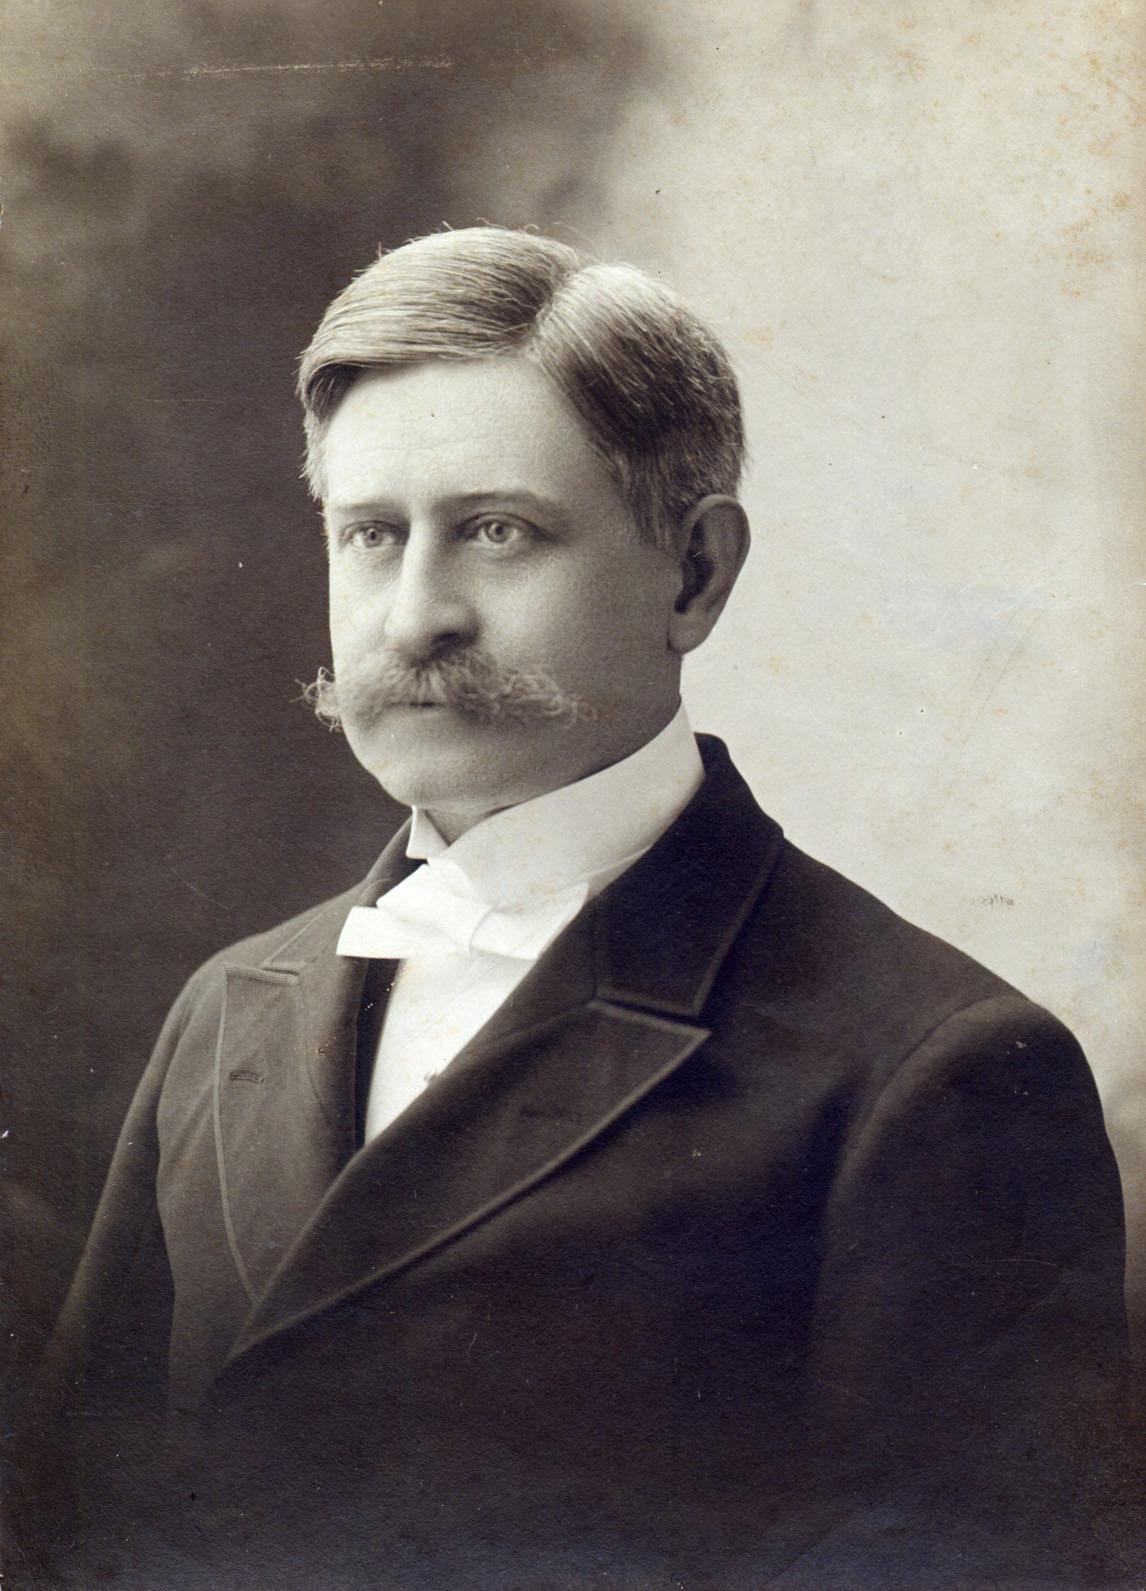 George E. MacLean portrait